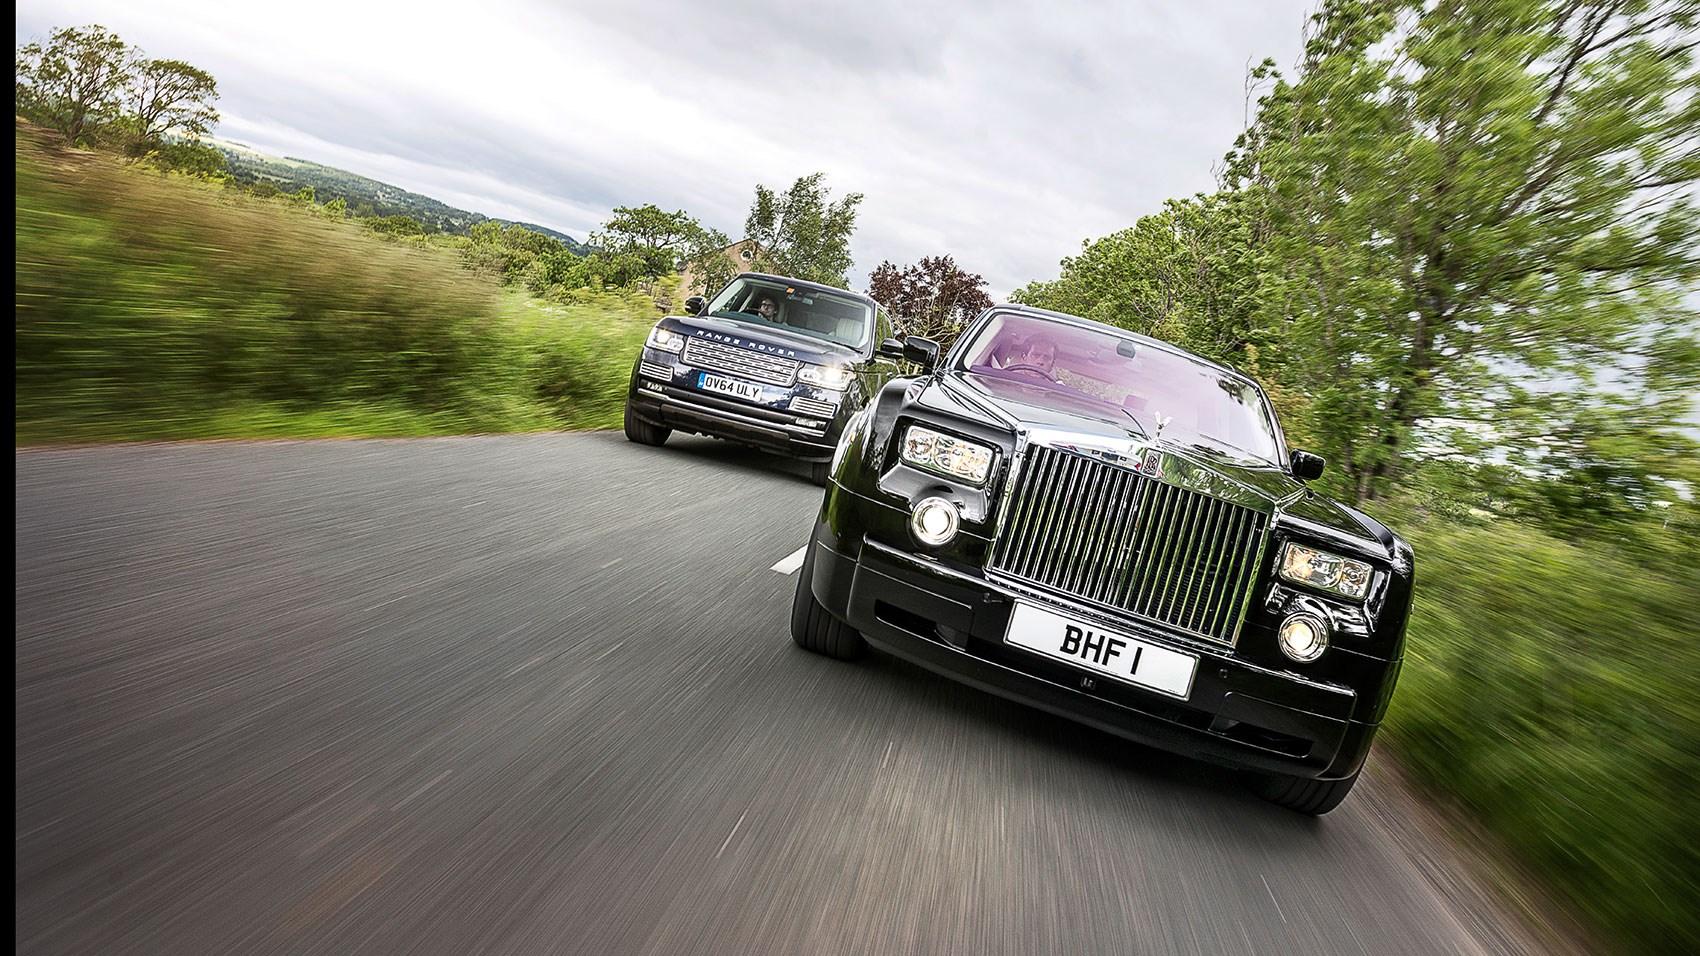 icon buyer new range rover vs used rolls royce phantom car september 2015 car magazine. Black Bedroom Furniture Sets. Home Design Ideas